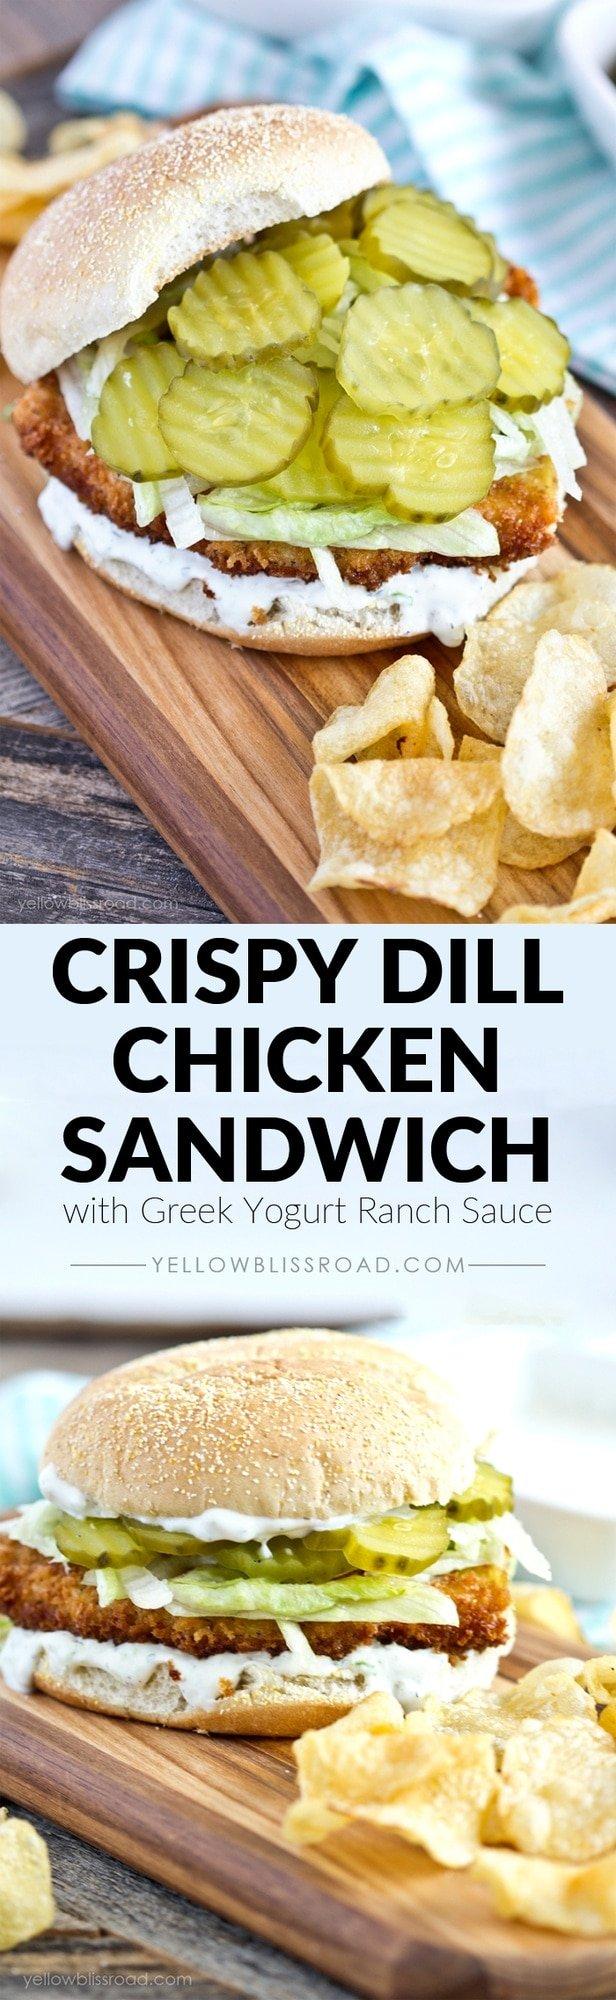 Crispy Dill Chicken Sandwich with Greek Yogurt Ranch Spread